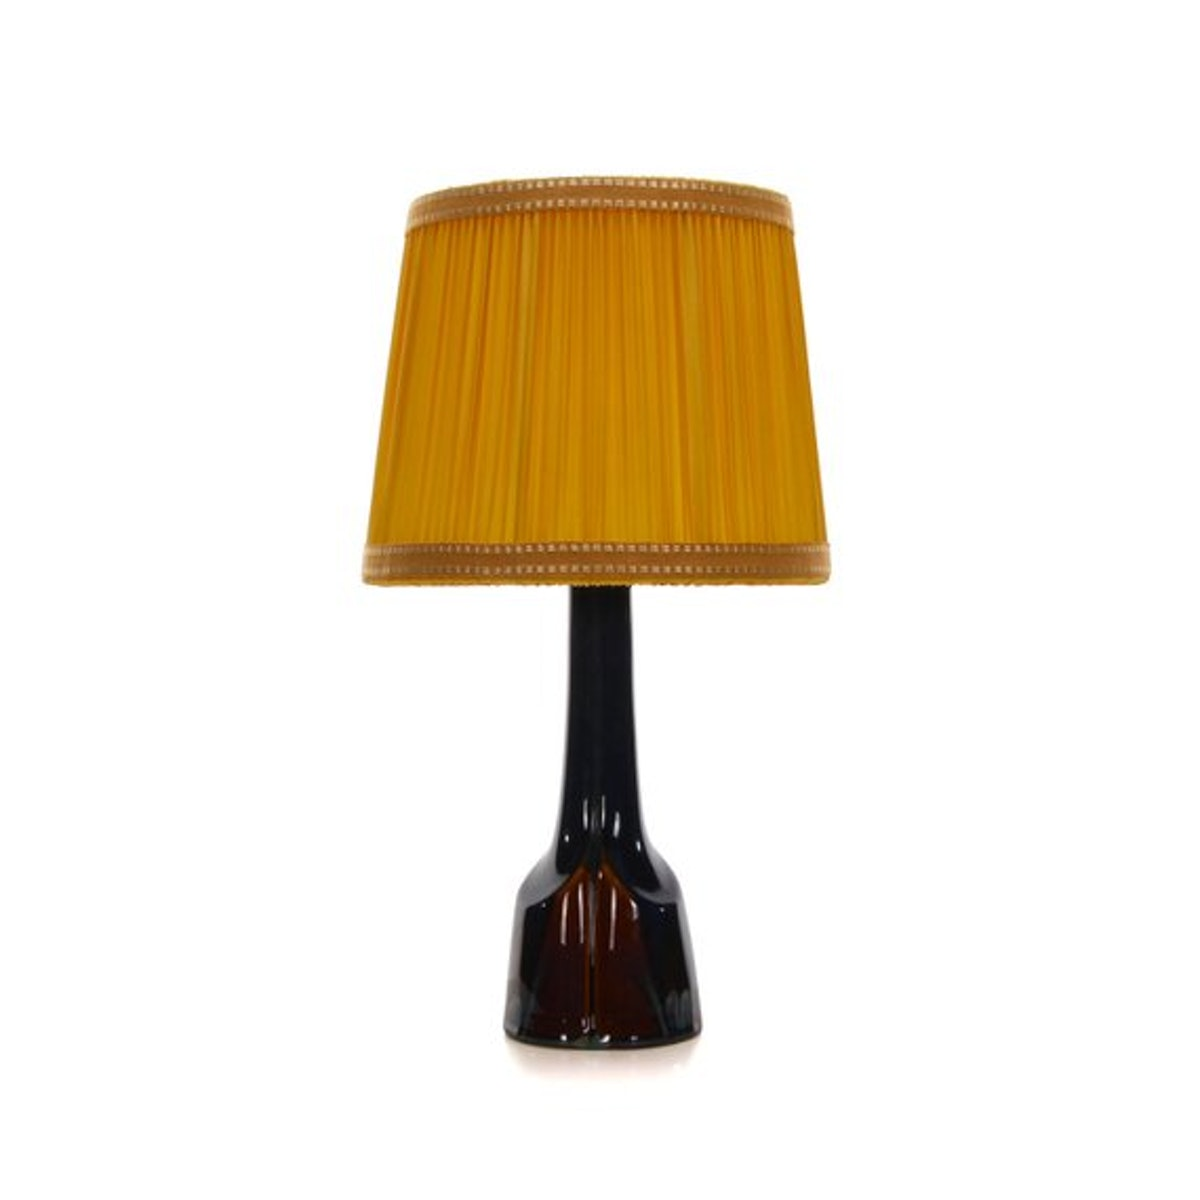 NO. 940 Ceramic Table Lamp